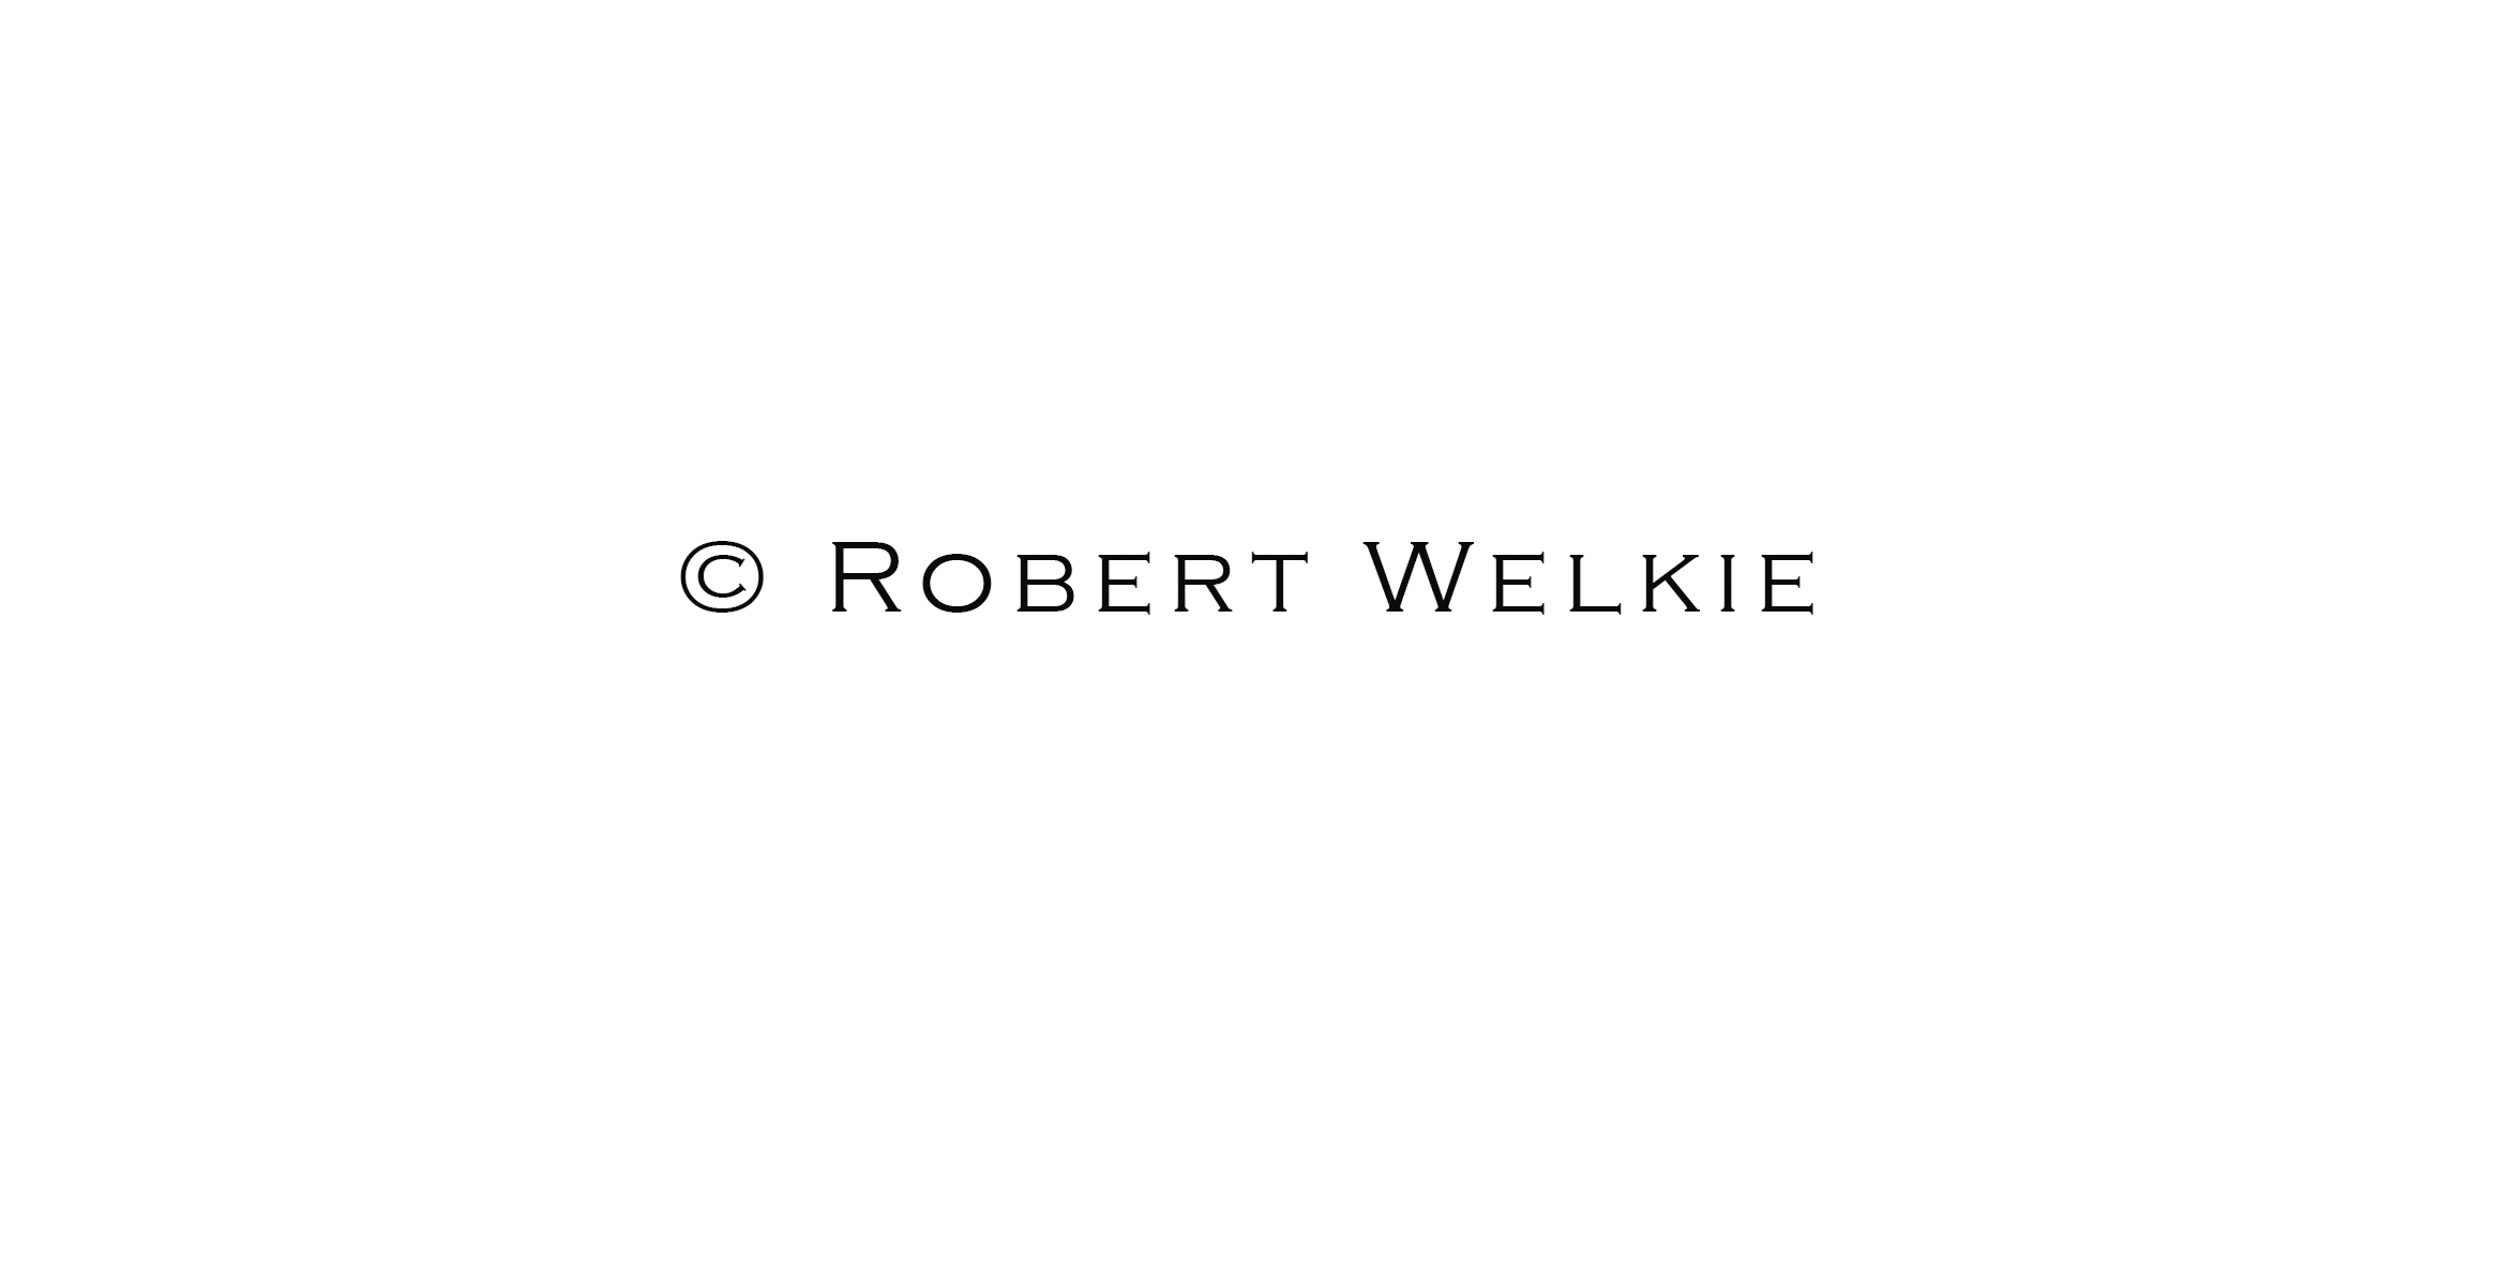 Robert Welkie Title Card.jpg